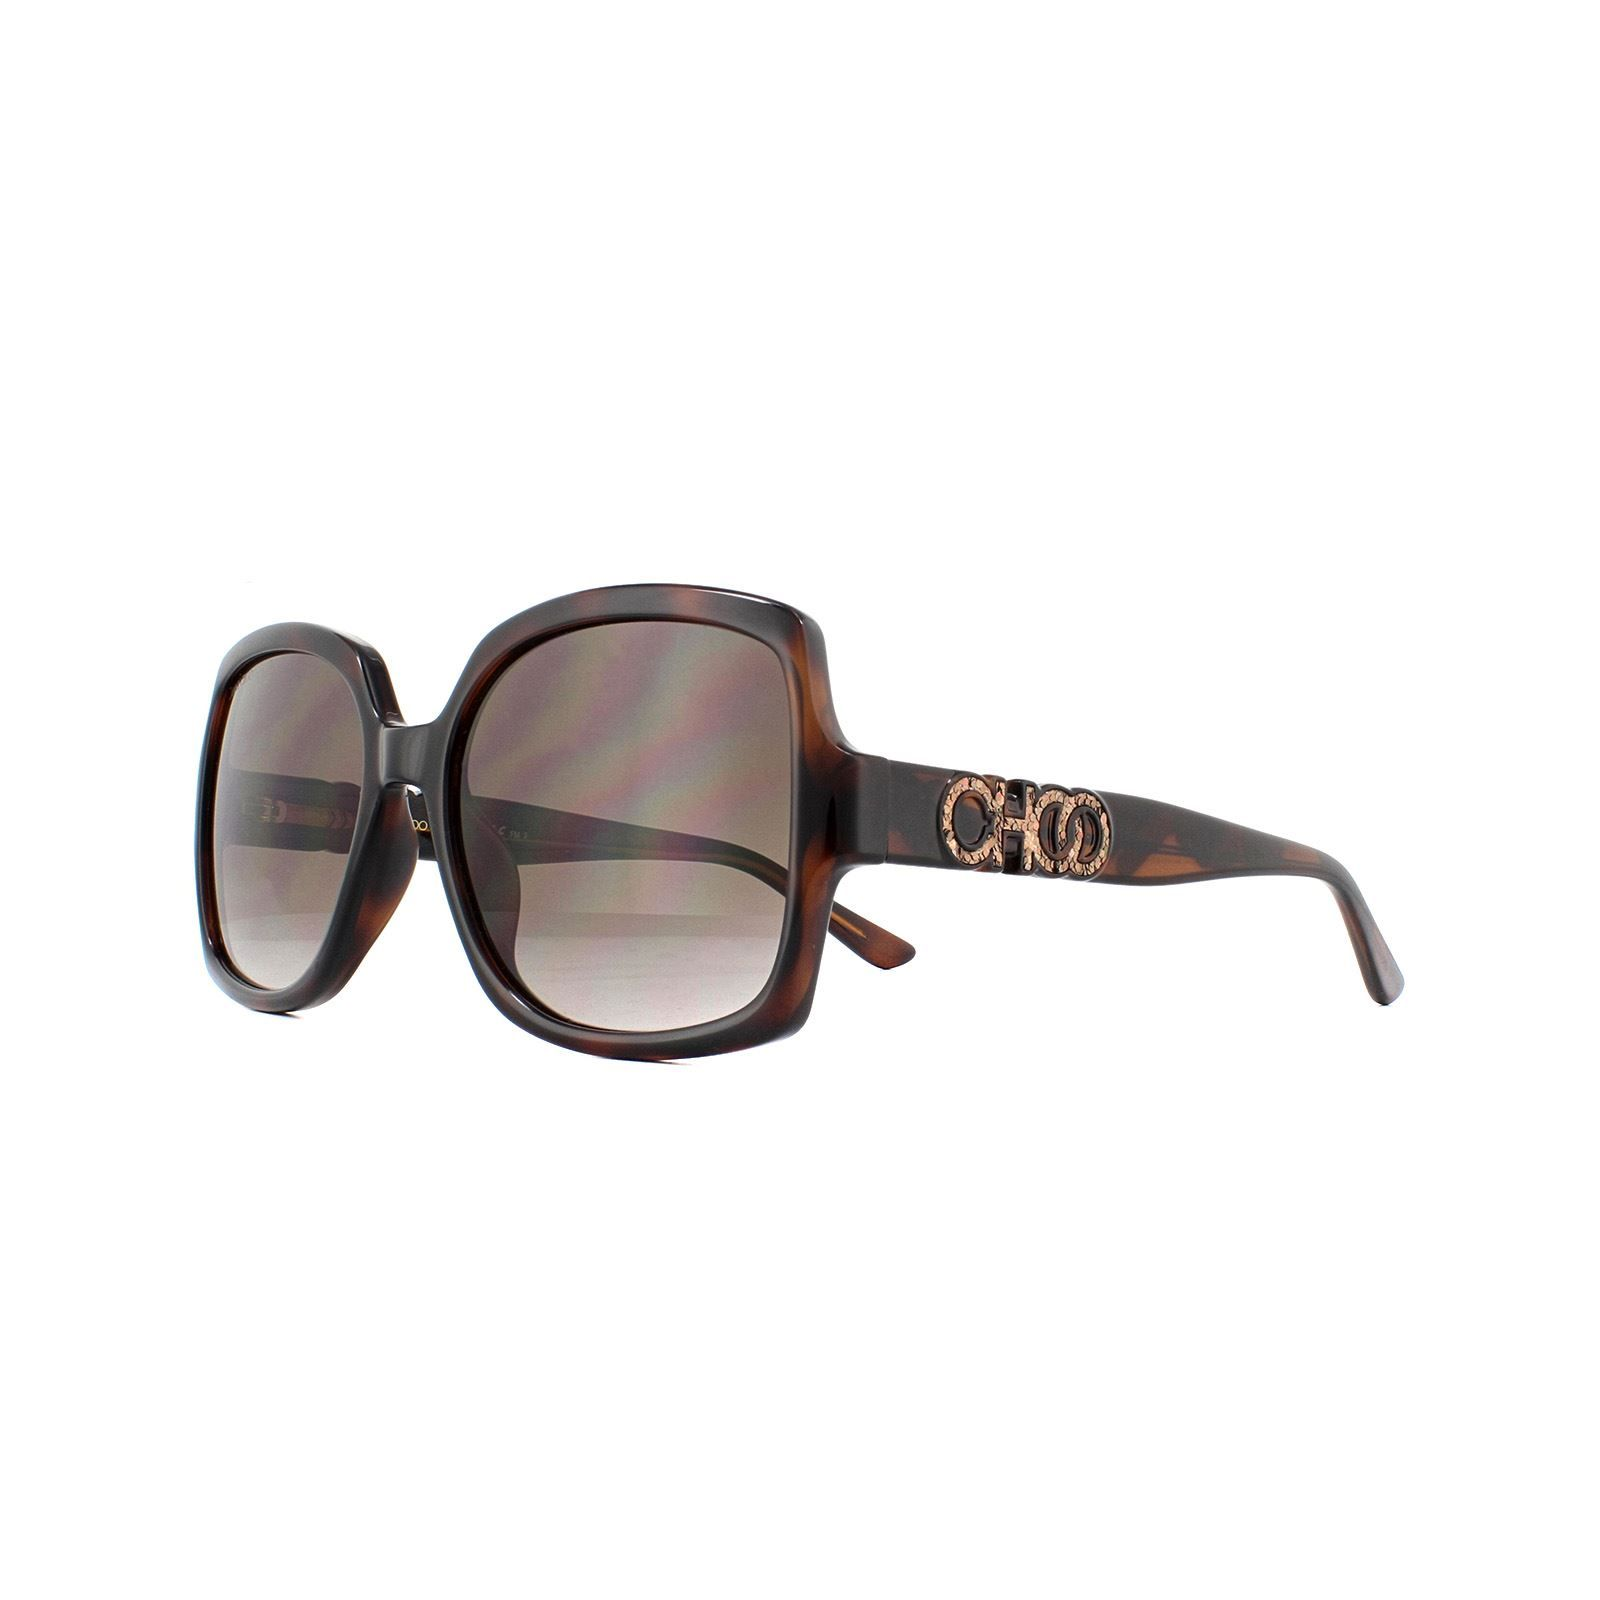 Jimmy Choo Sunglasses SAMMI/G/S 086 HA Dark Havana Brown Gradient